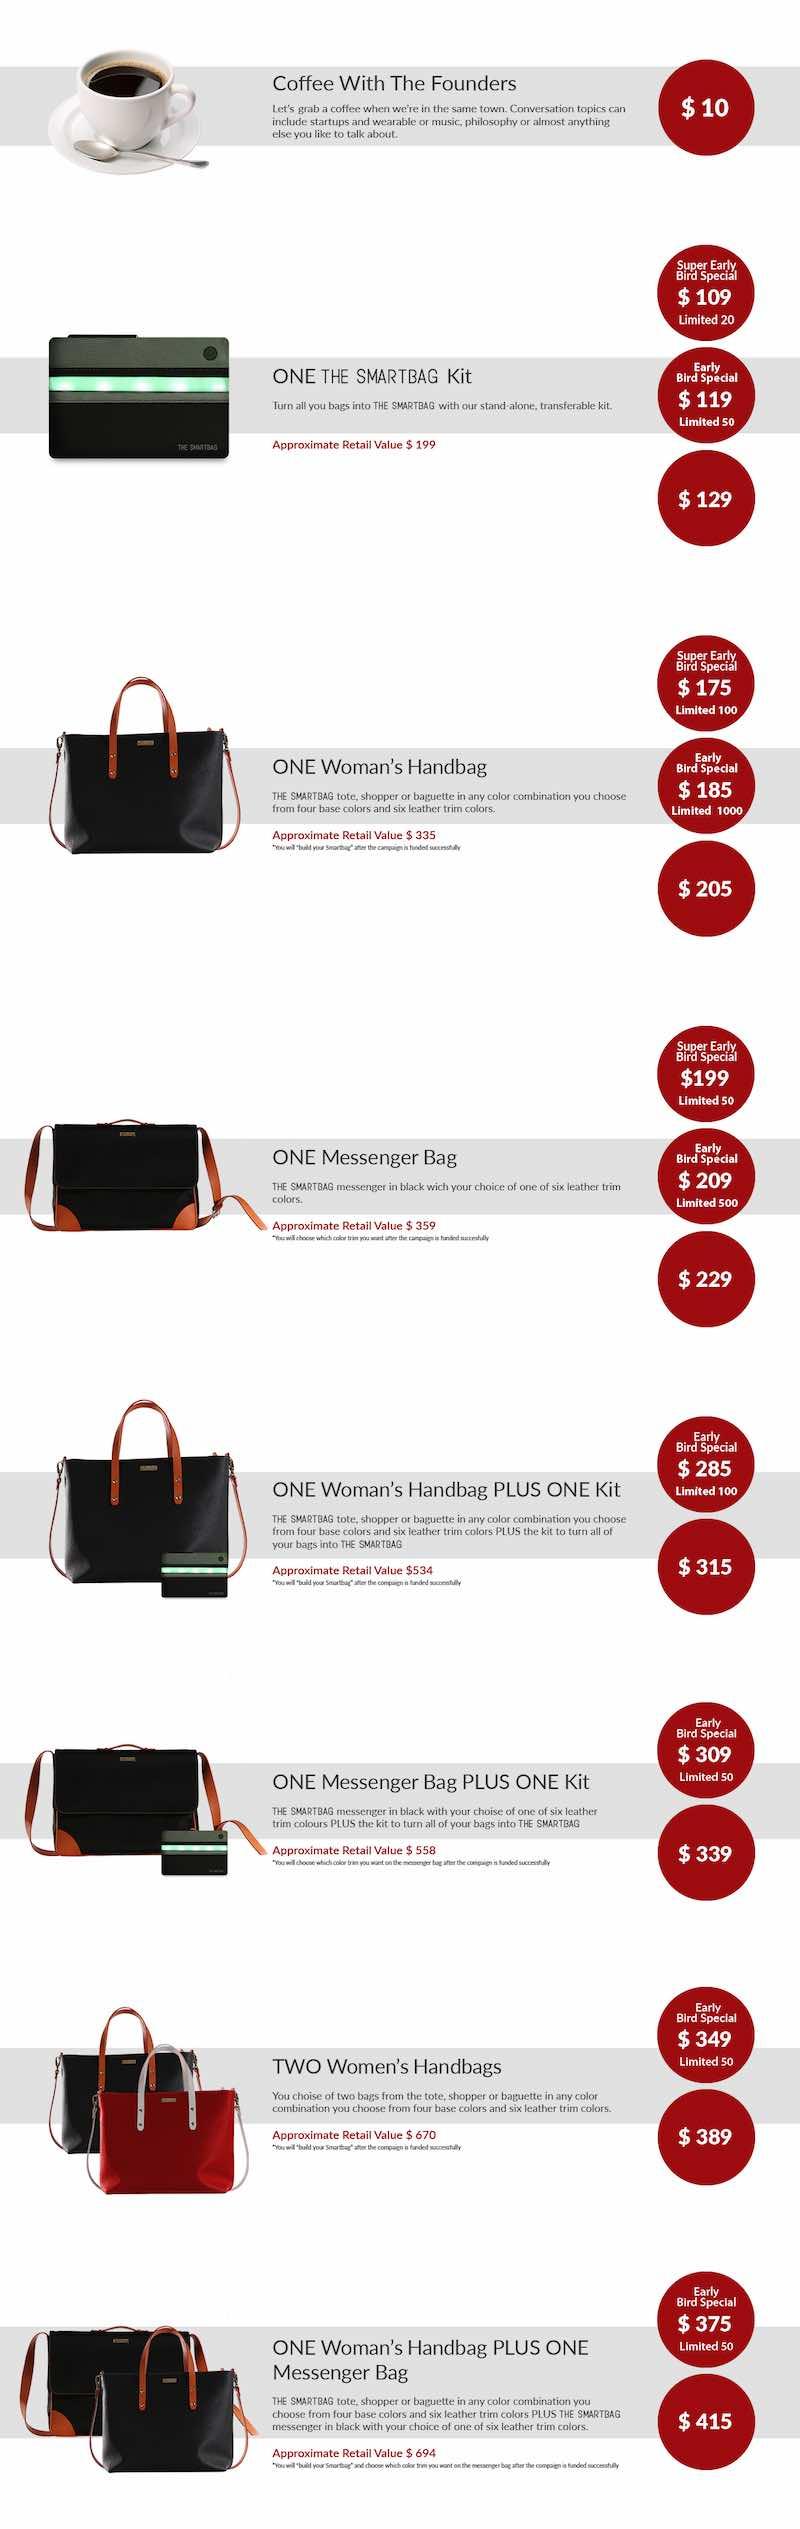 Smartbag Kickstarter